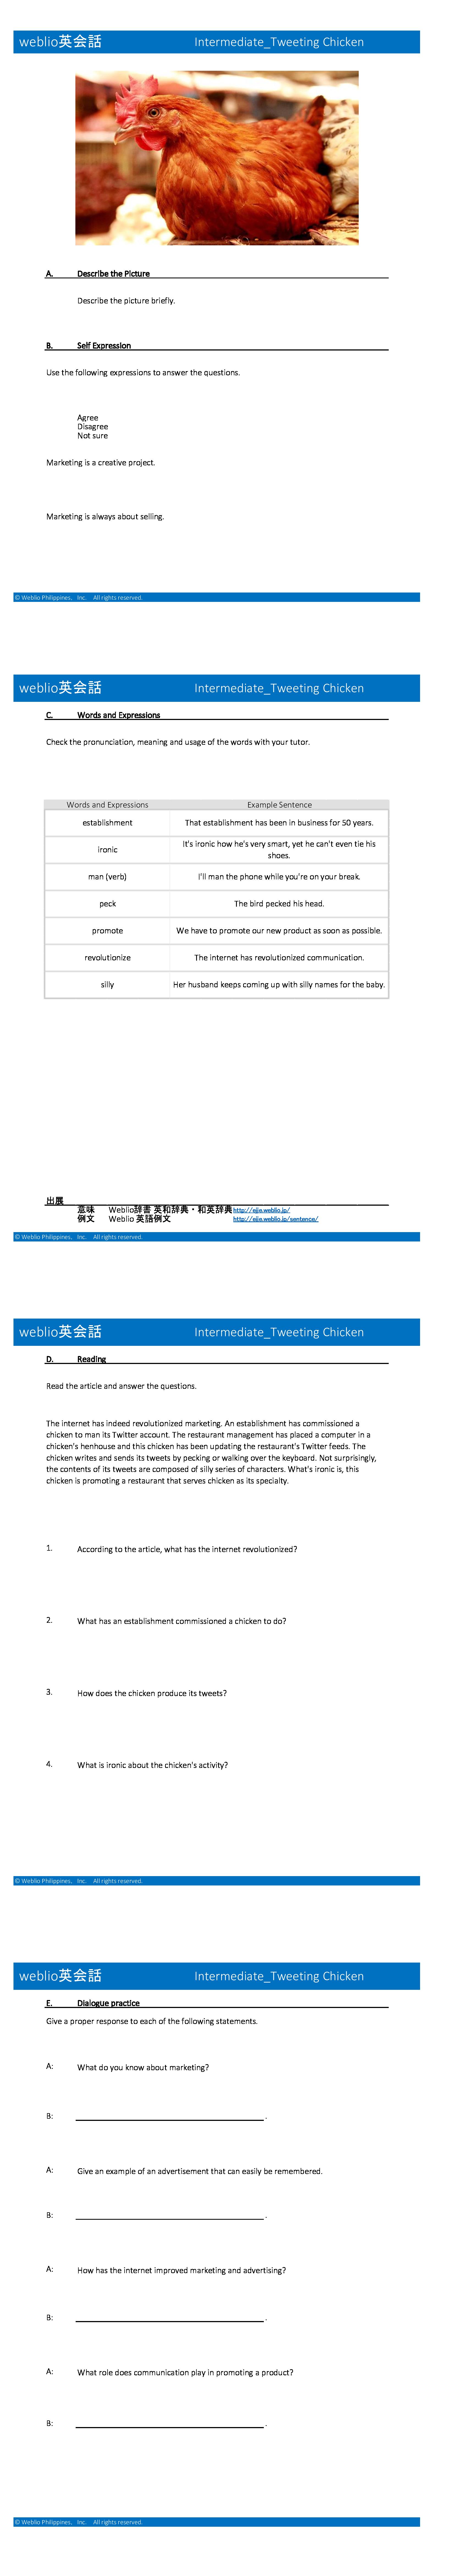 per-level-intermediate-tweeting-chicken-en